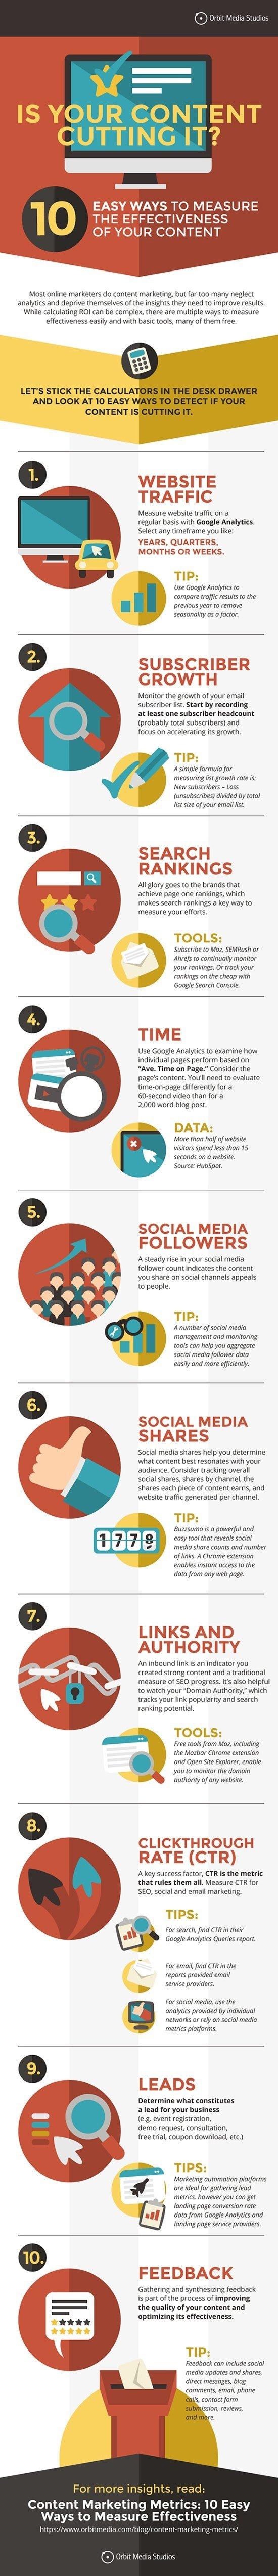 Content Marketing Metrics: 10 Easy Ways to Measure Effectiveness - #infographic